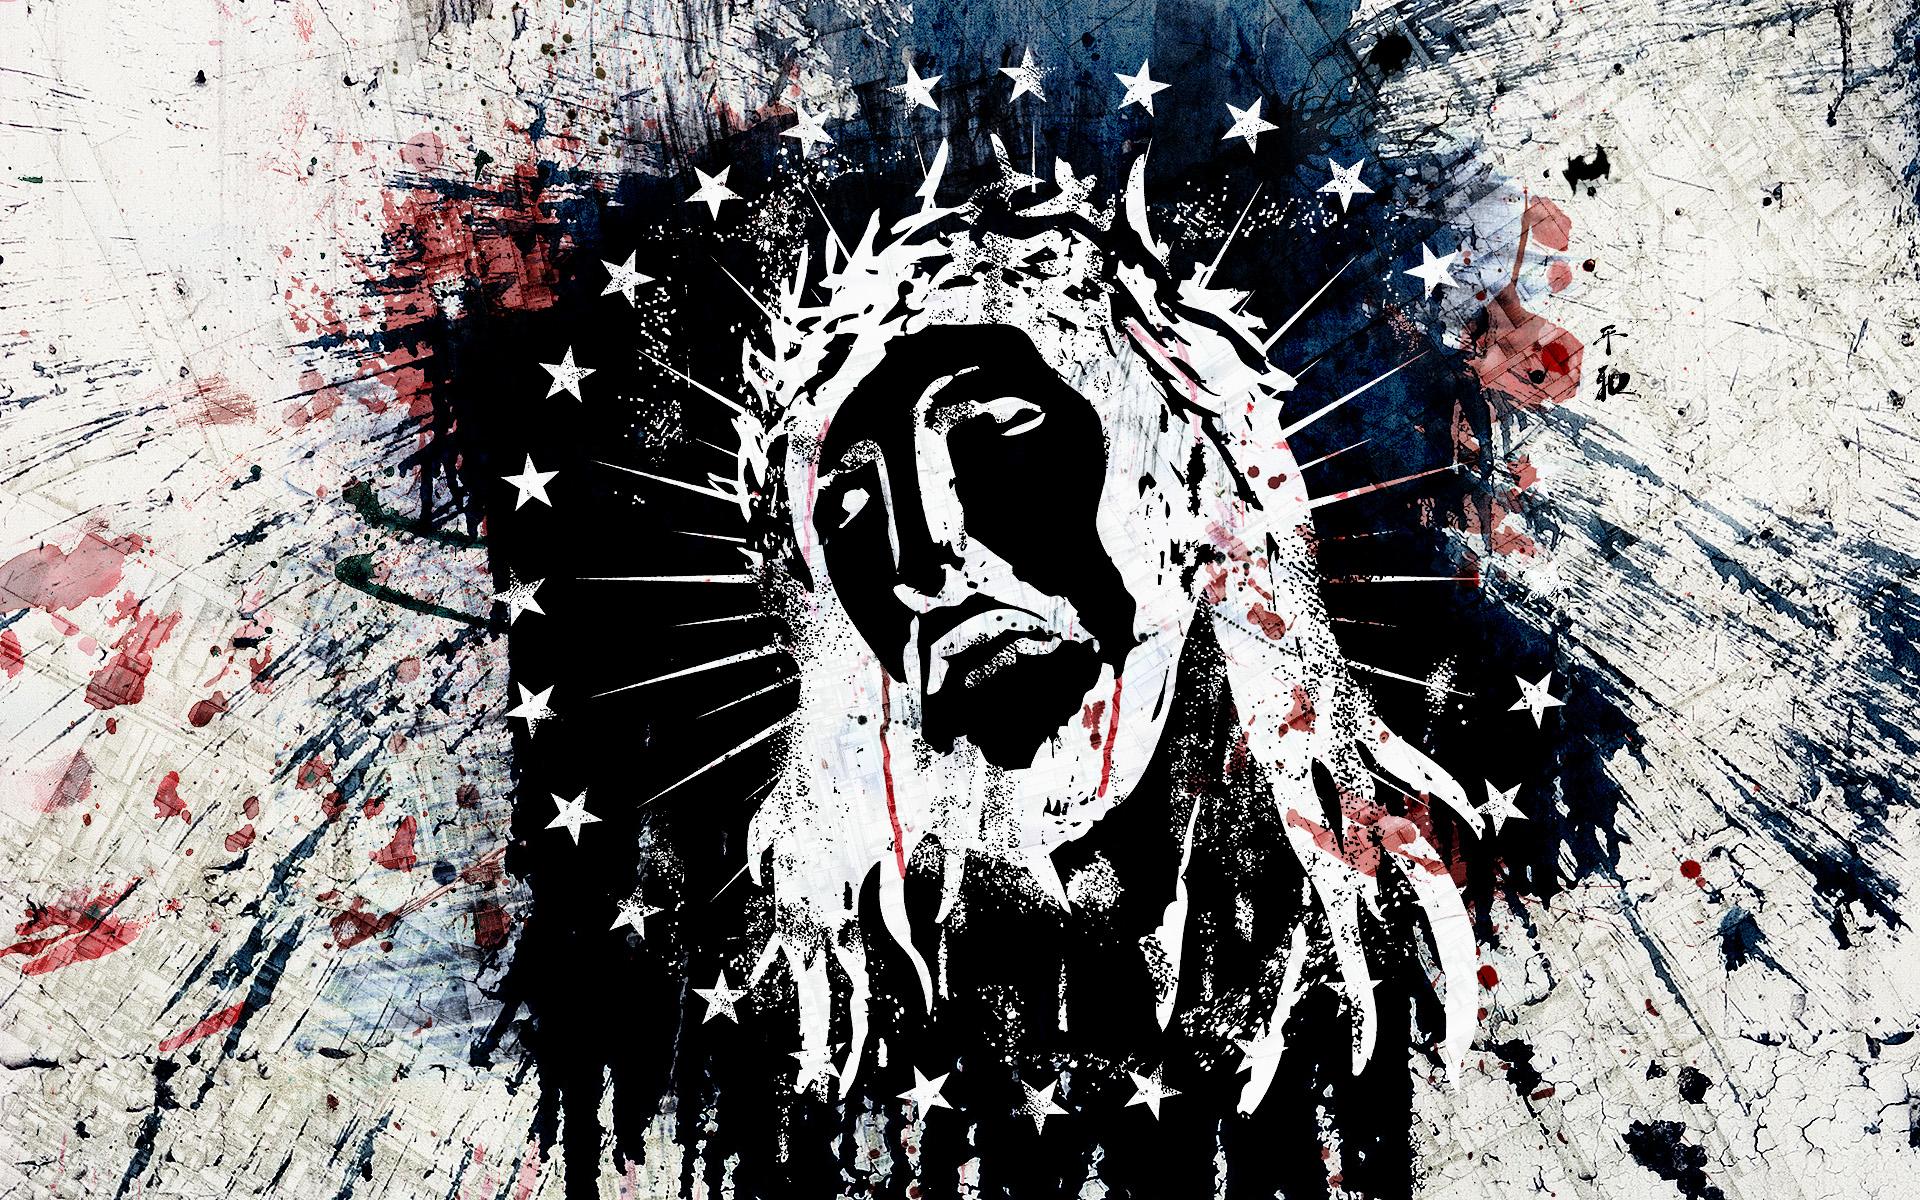 Jesus Hd Wallpaper Background Image 1920x1200 Id 363899